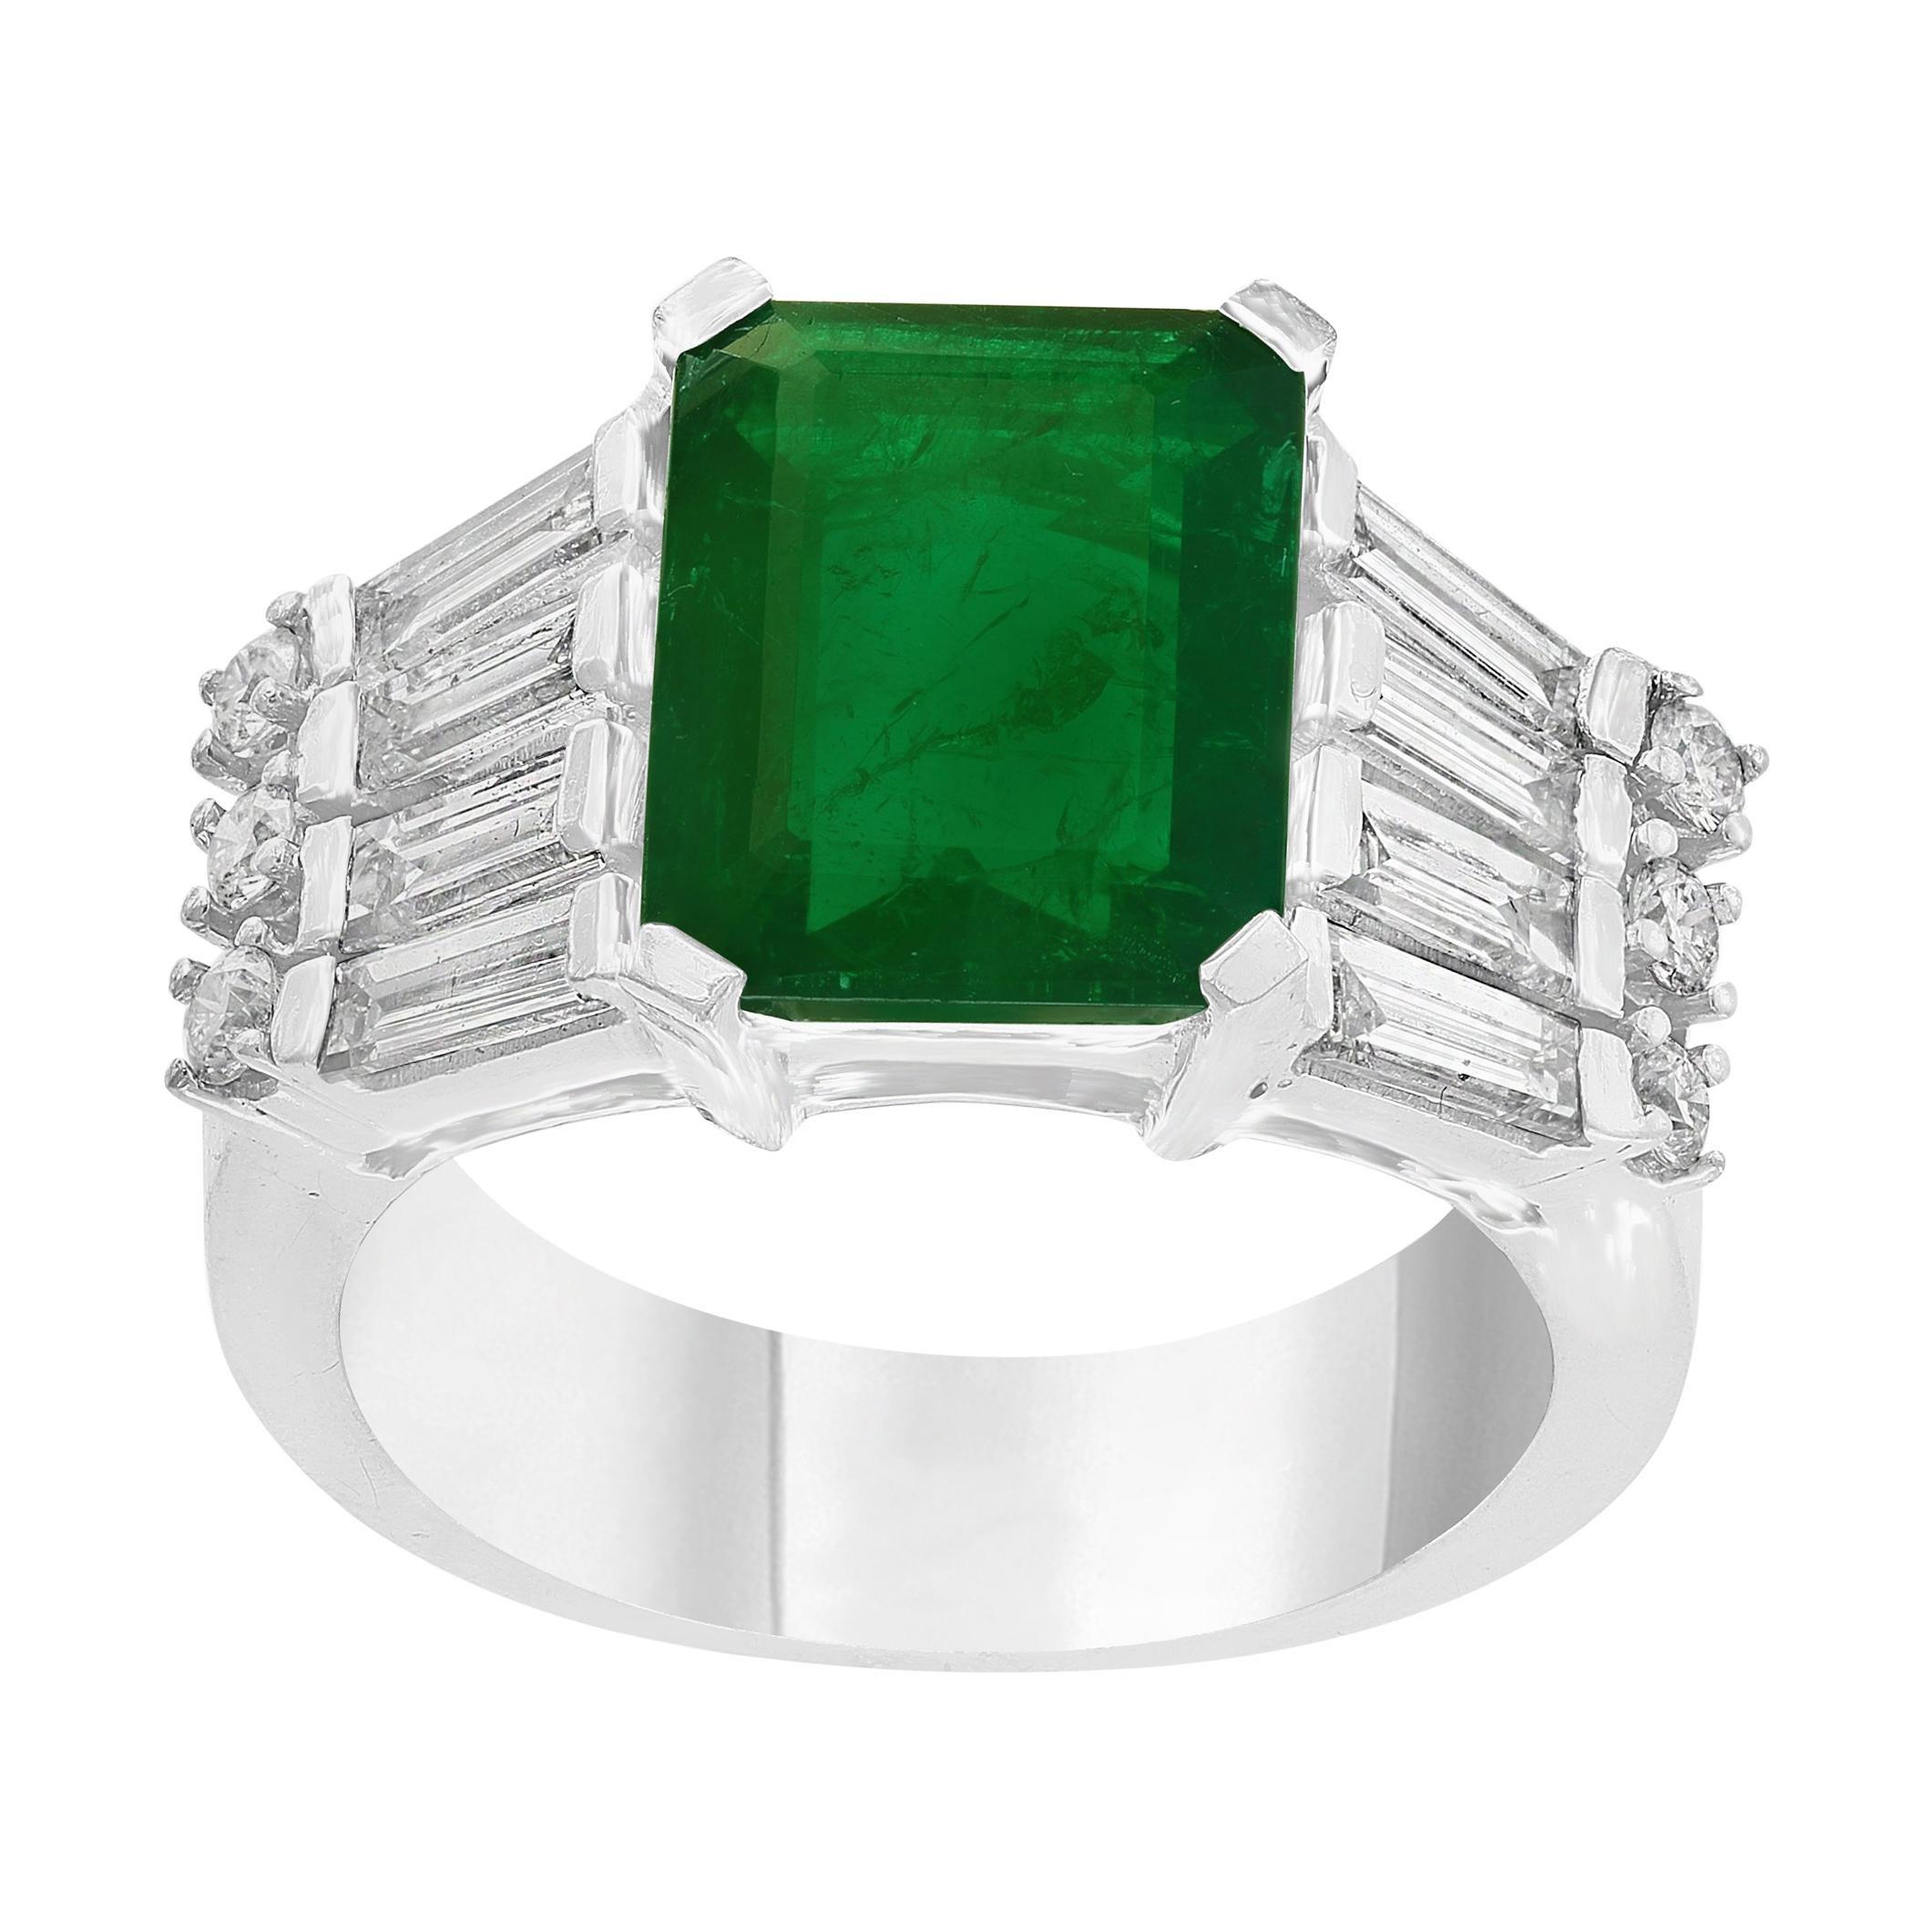 5.5 Carat Emerald Cut Emerald and Diamond Ring 18 Karat Gold Ring